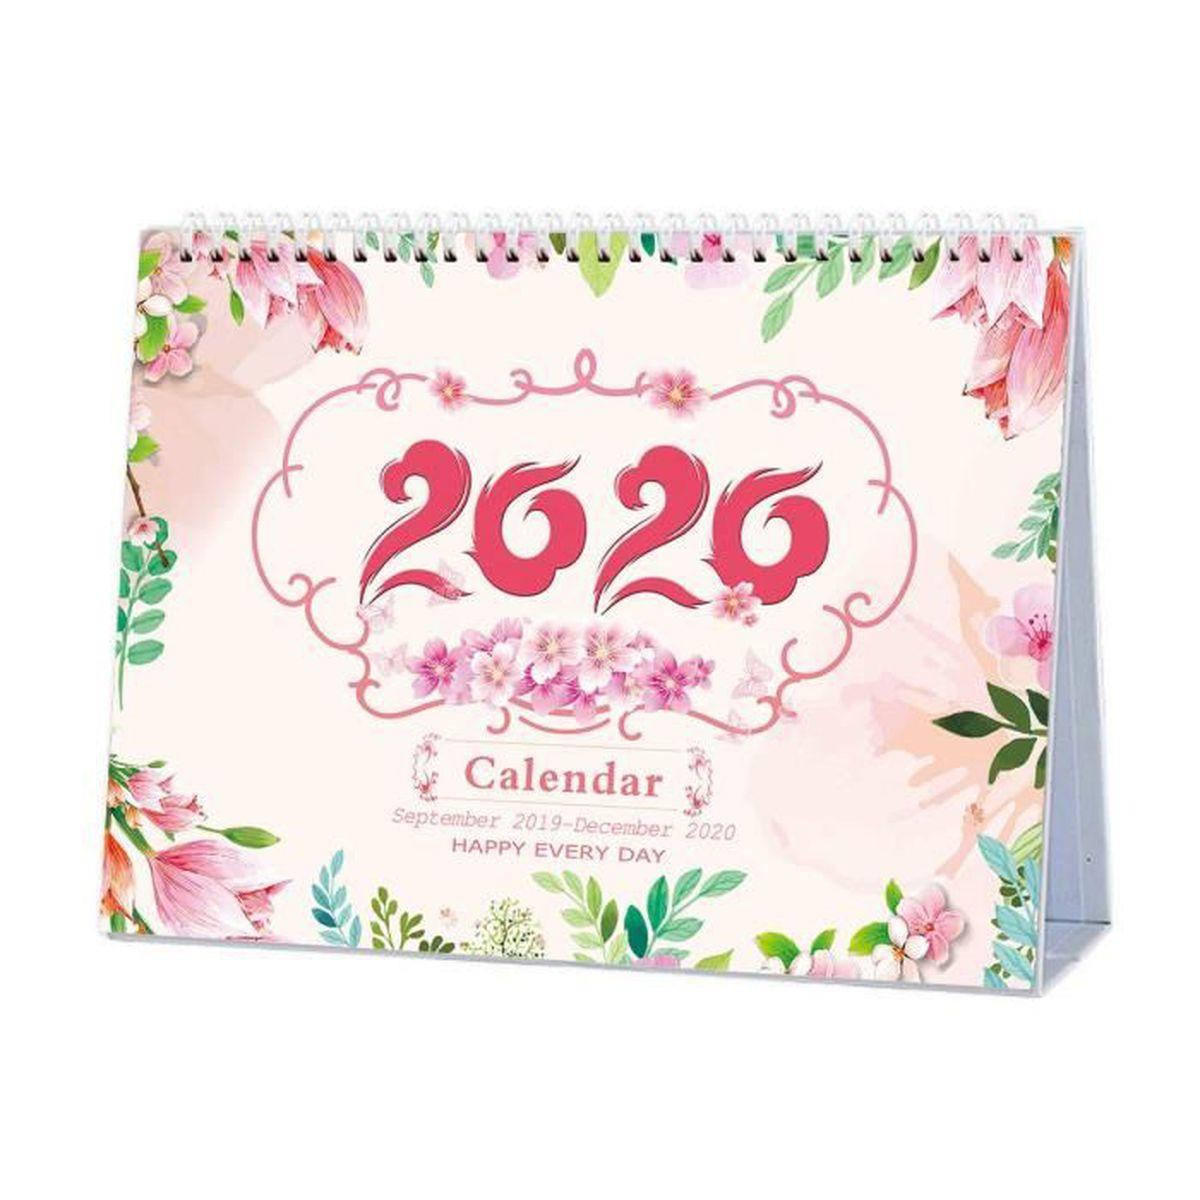 Calendrier De Decembre 2020.Calendrier De Bureau Septembre 2019 Decembre 2020 Mensuel